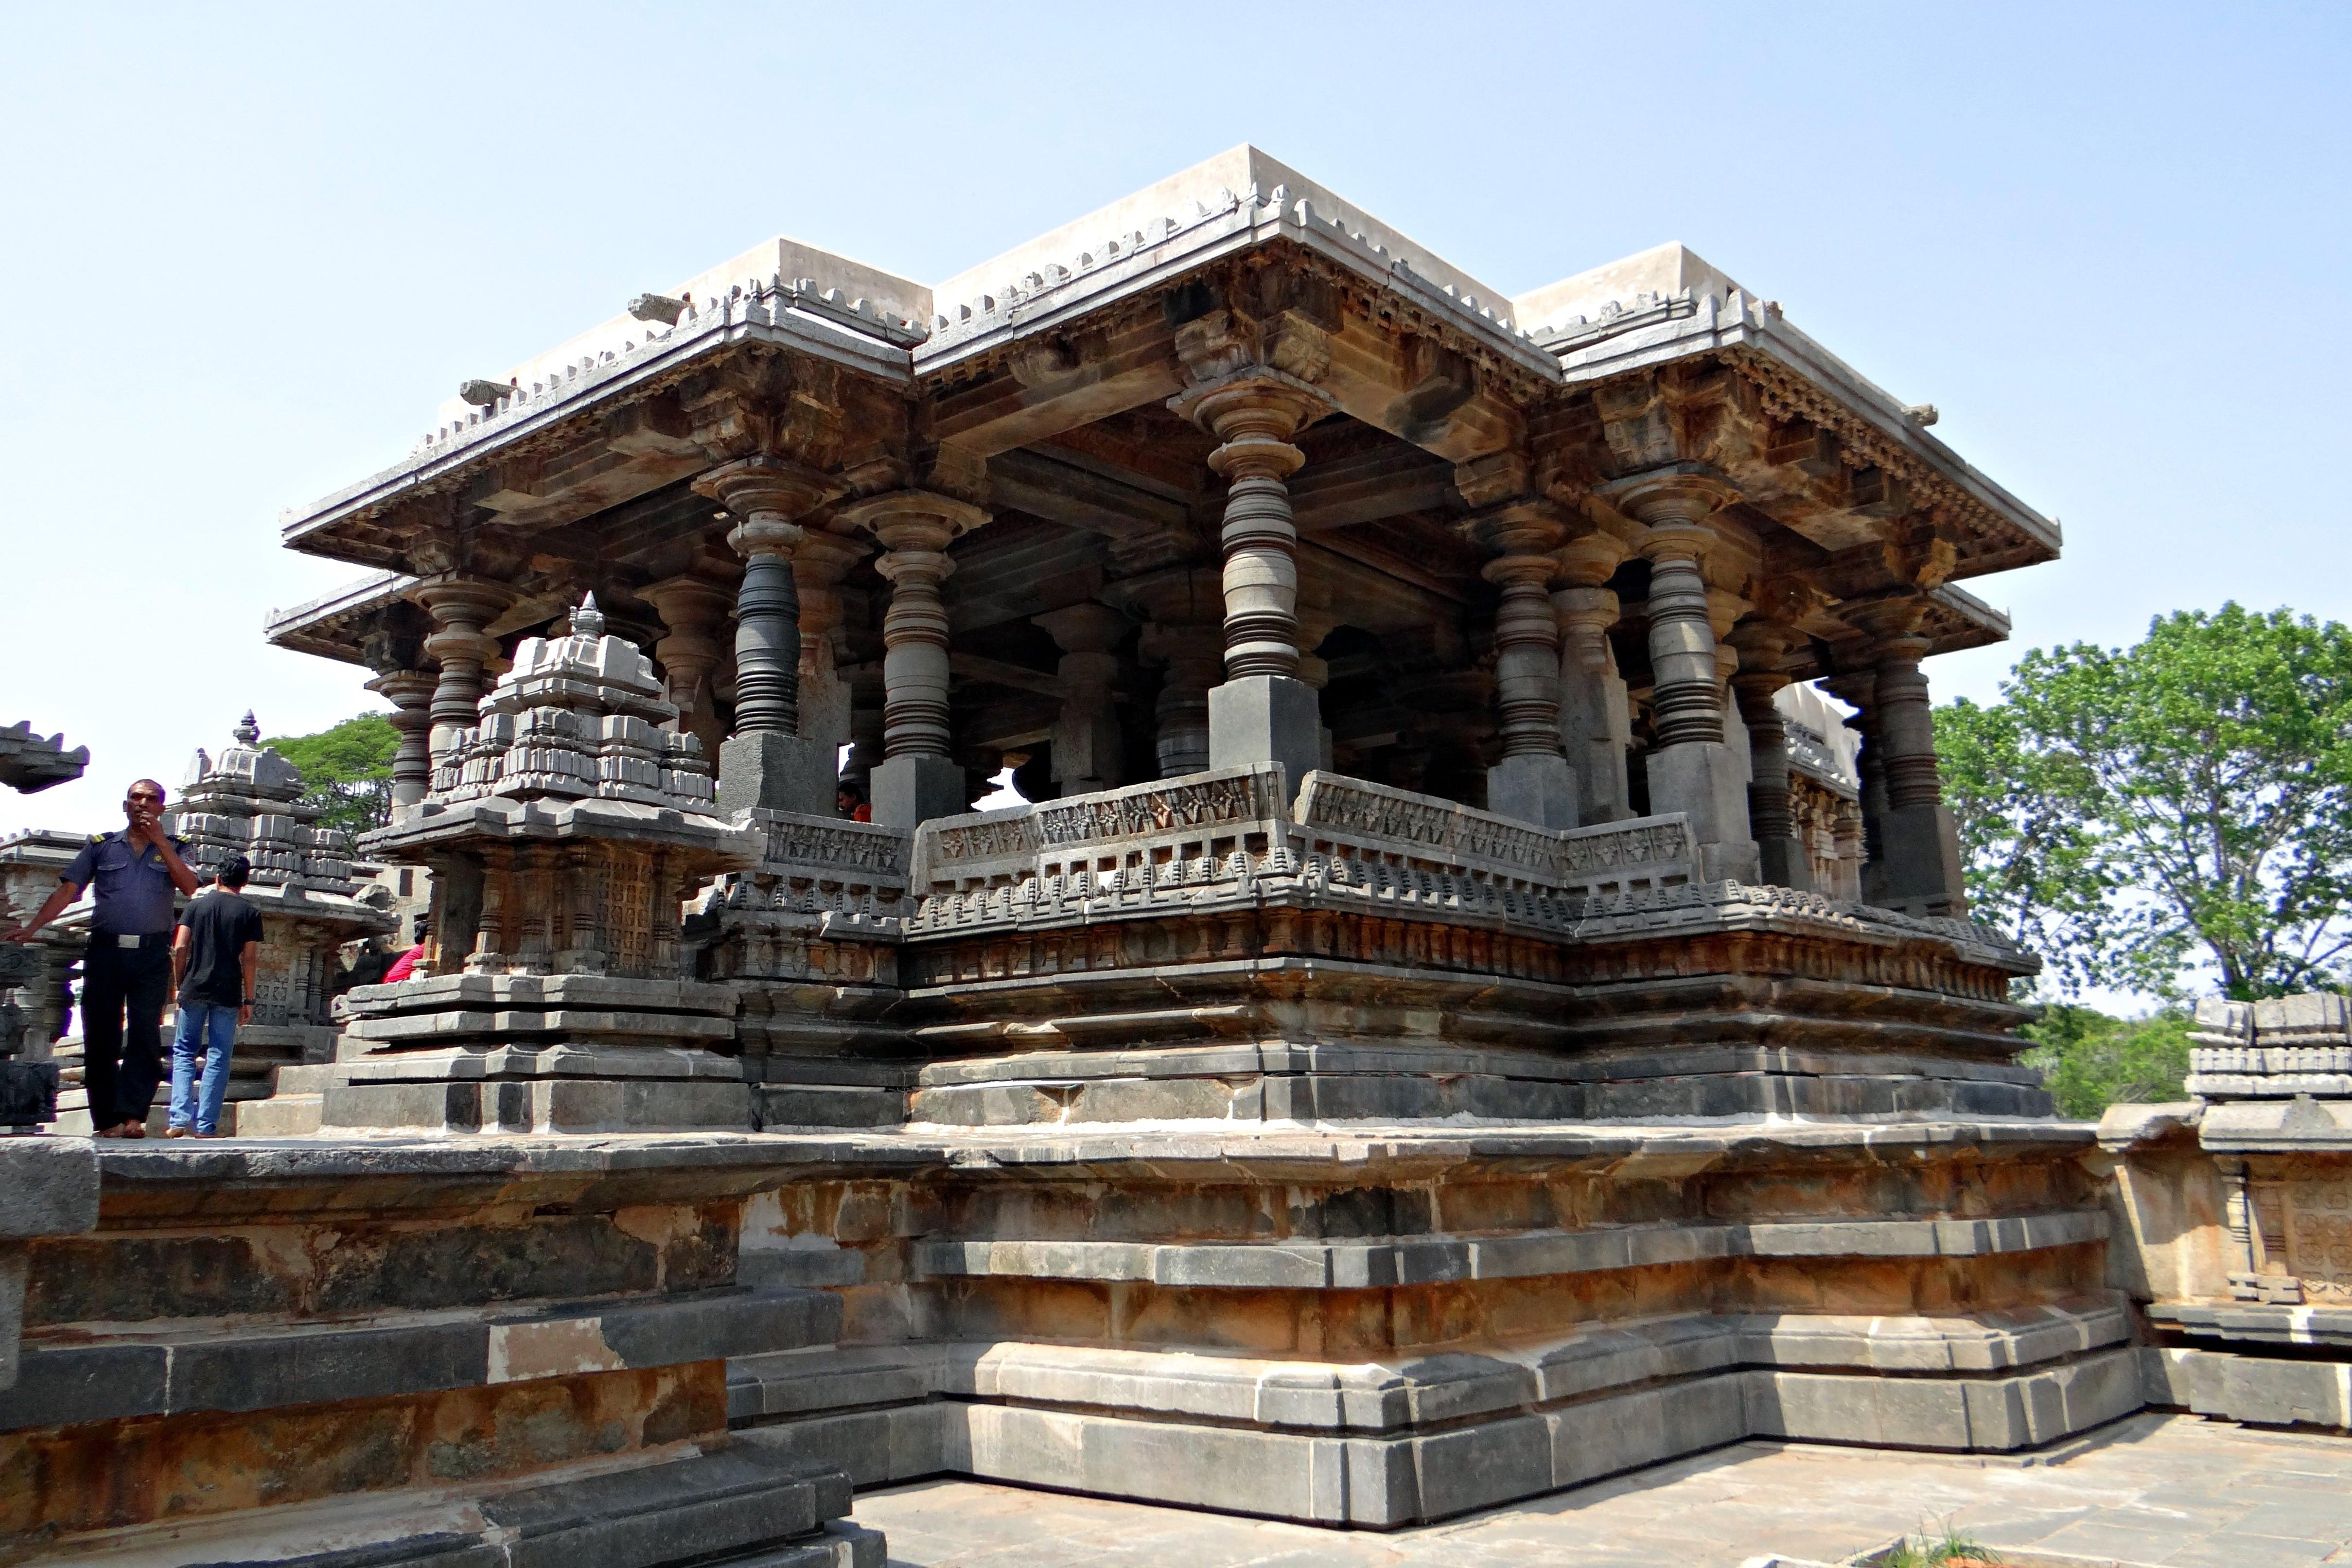 Grand Architecture & Goa Beach Tour from Mumbai 6